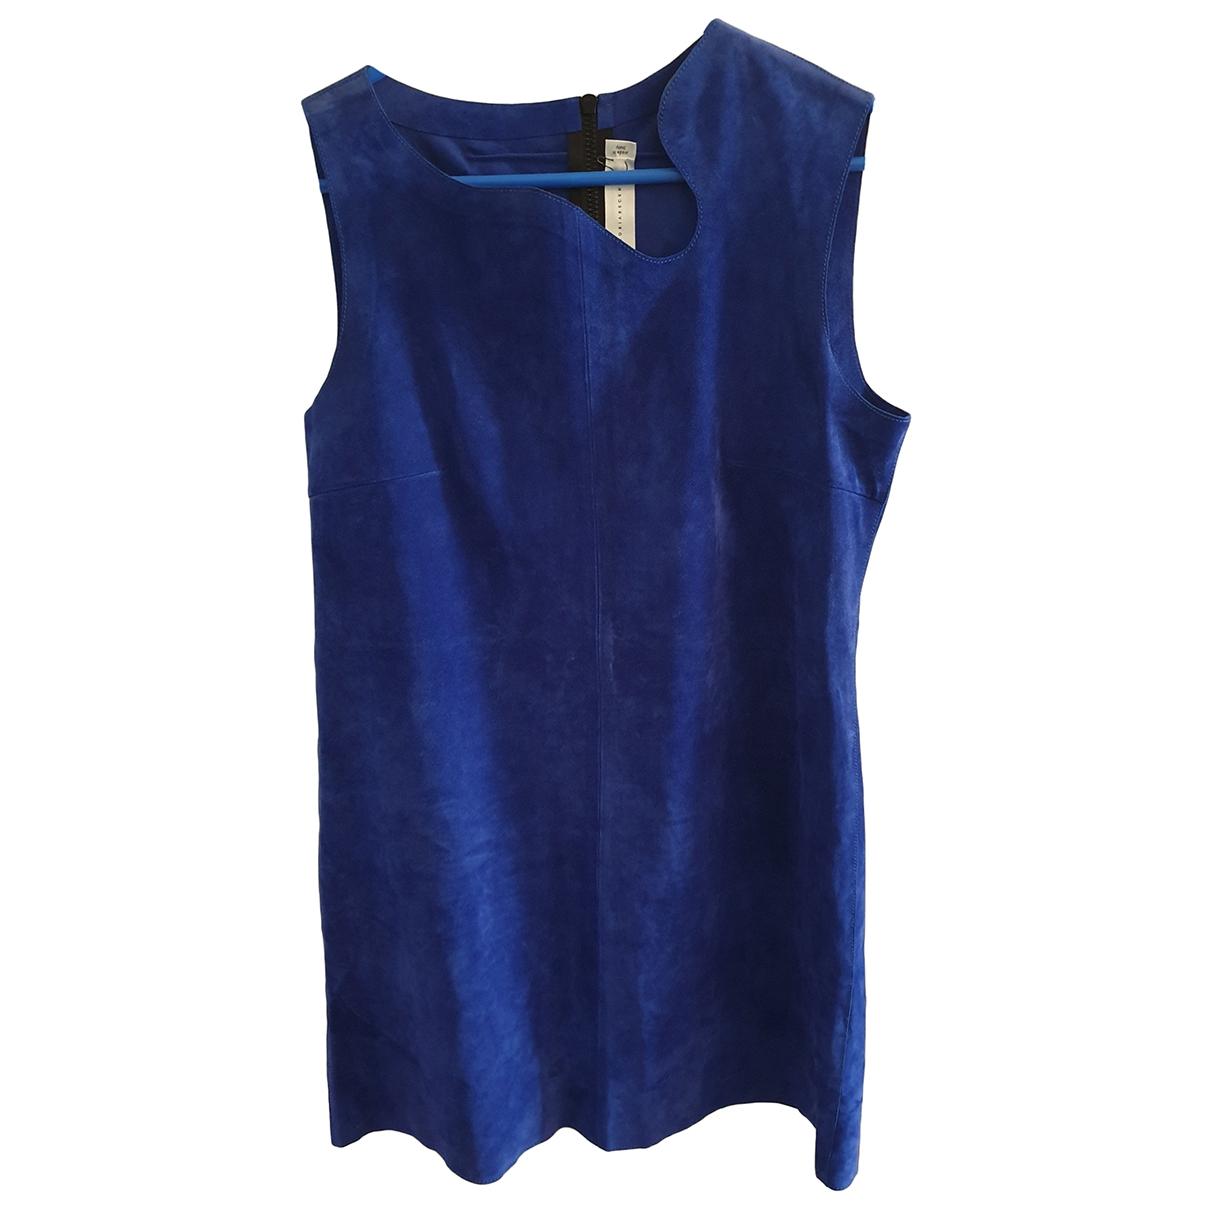 Victoria Beckham \N Kleid in  Blau Veloursleder